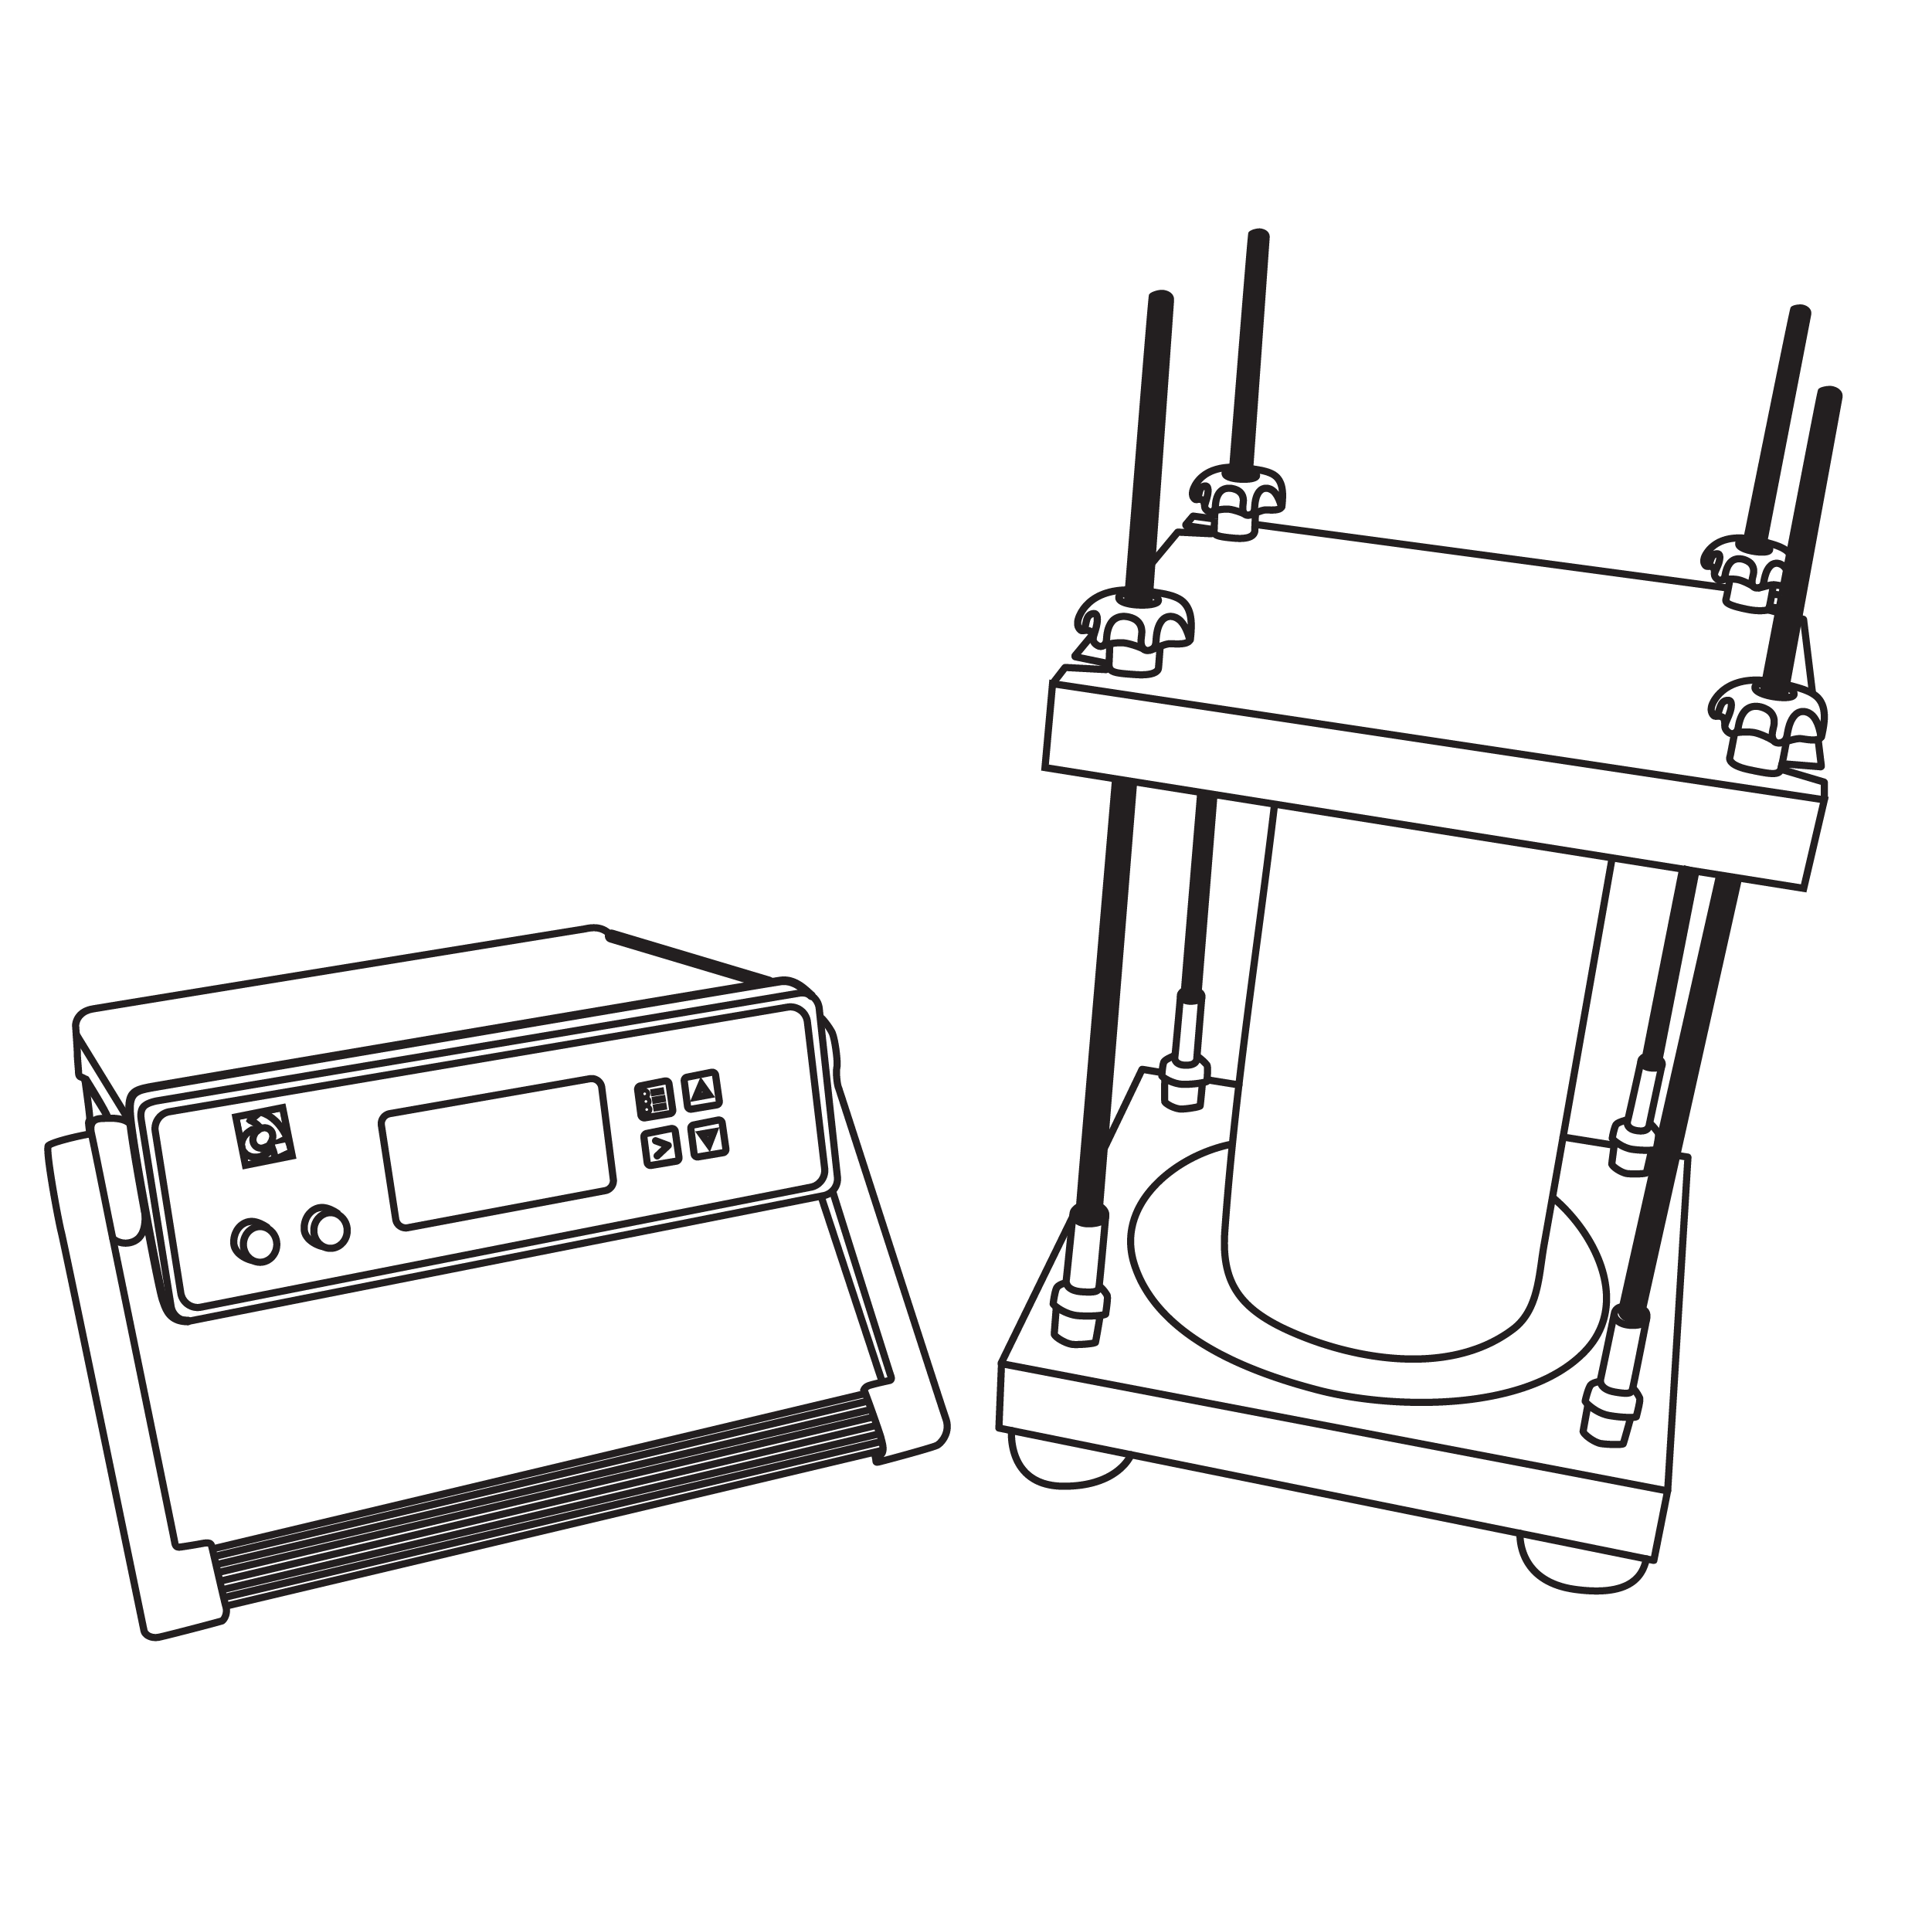 Equipment Trace-02